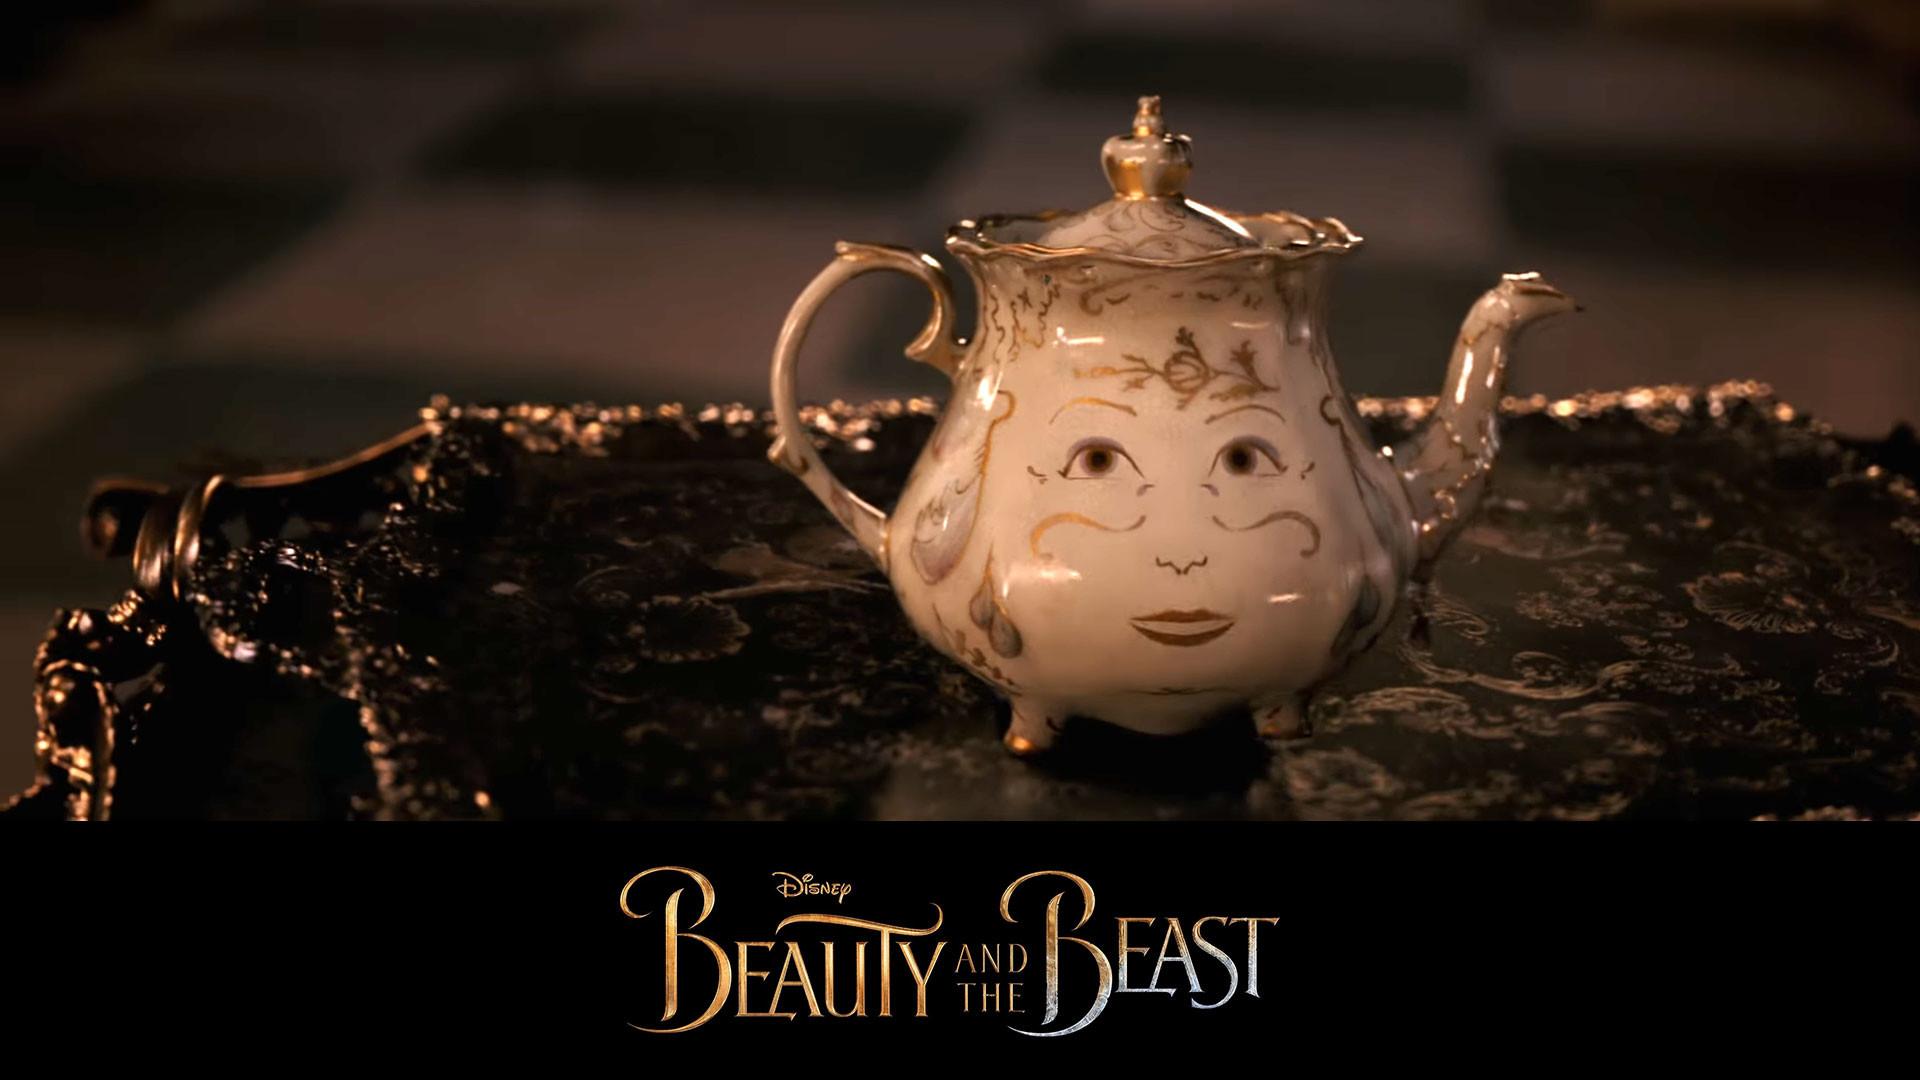 Beauty-and-the-Beast-Mrs-Potts-Wallpaper-HD